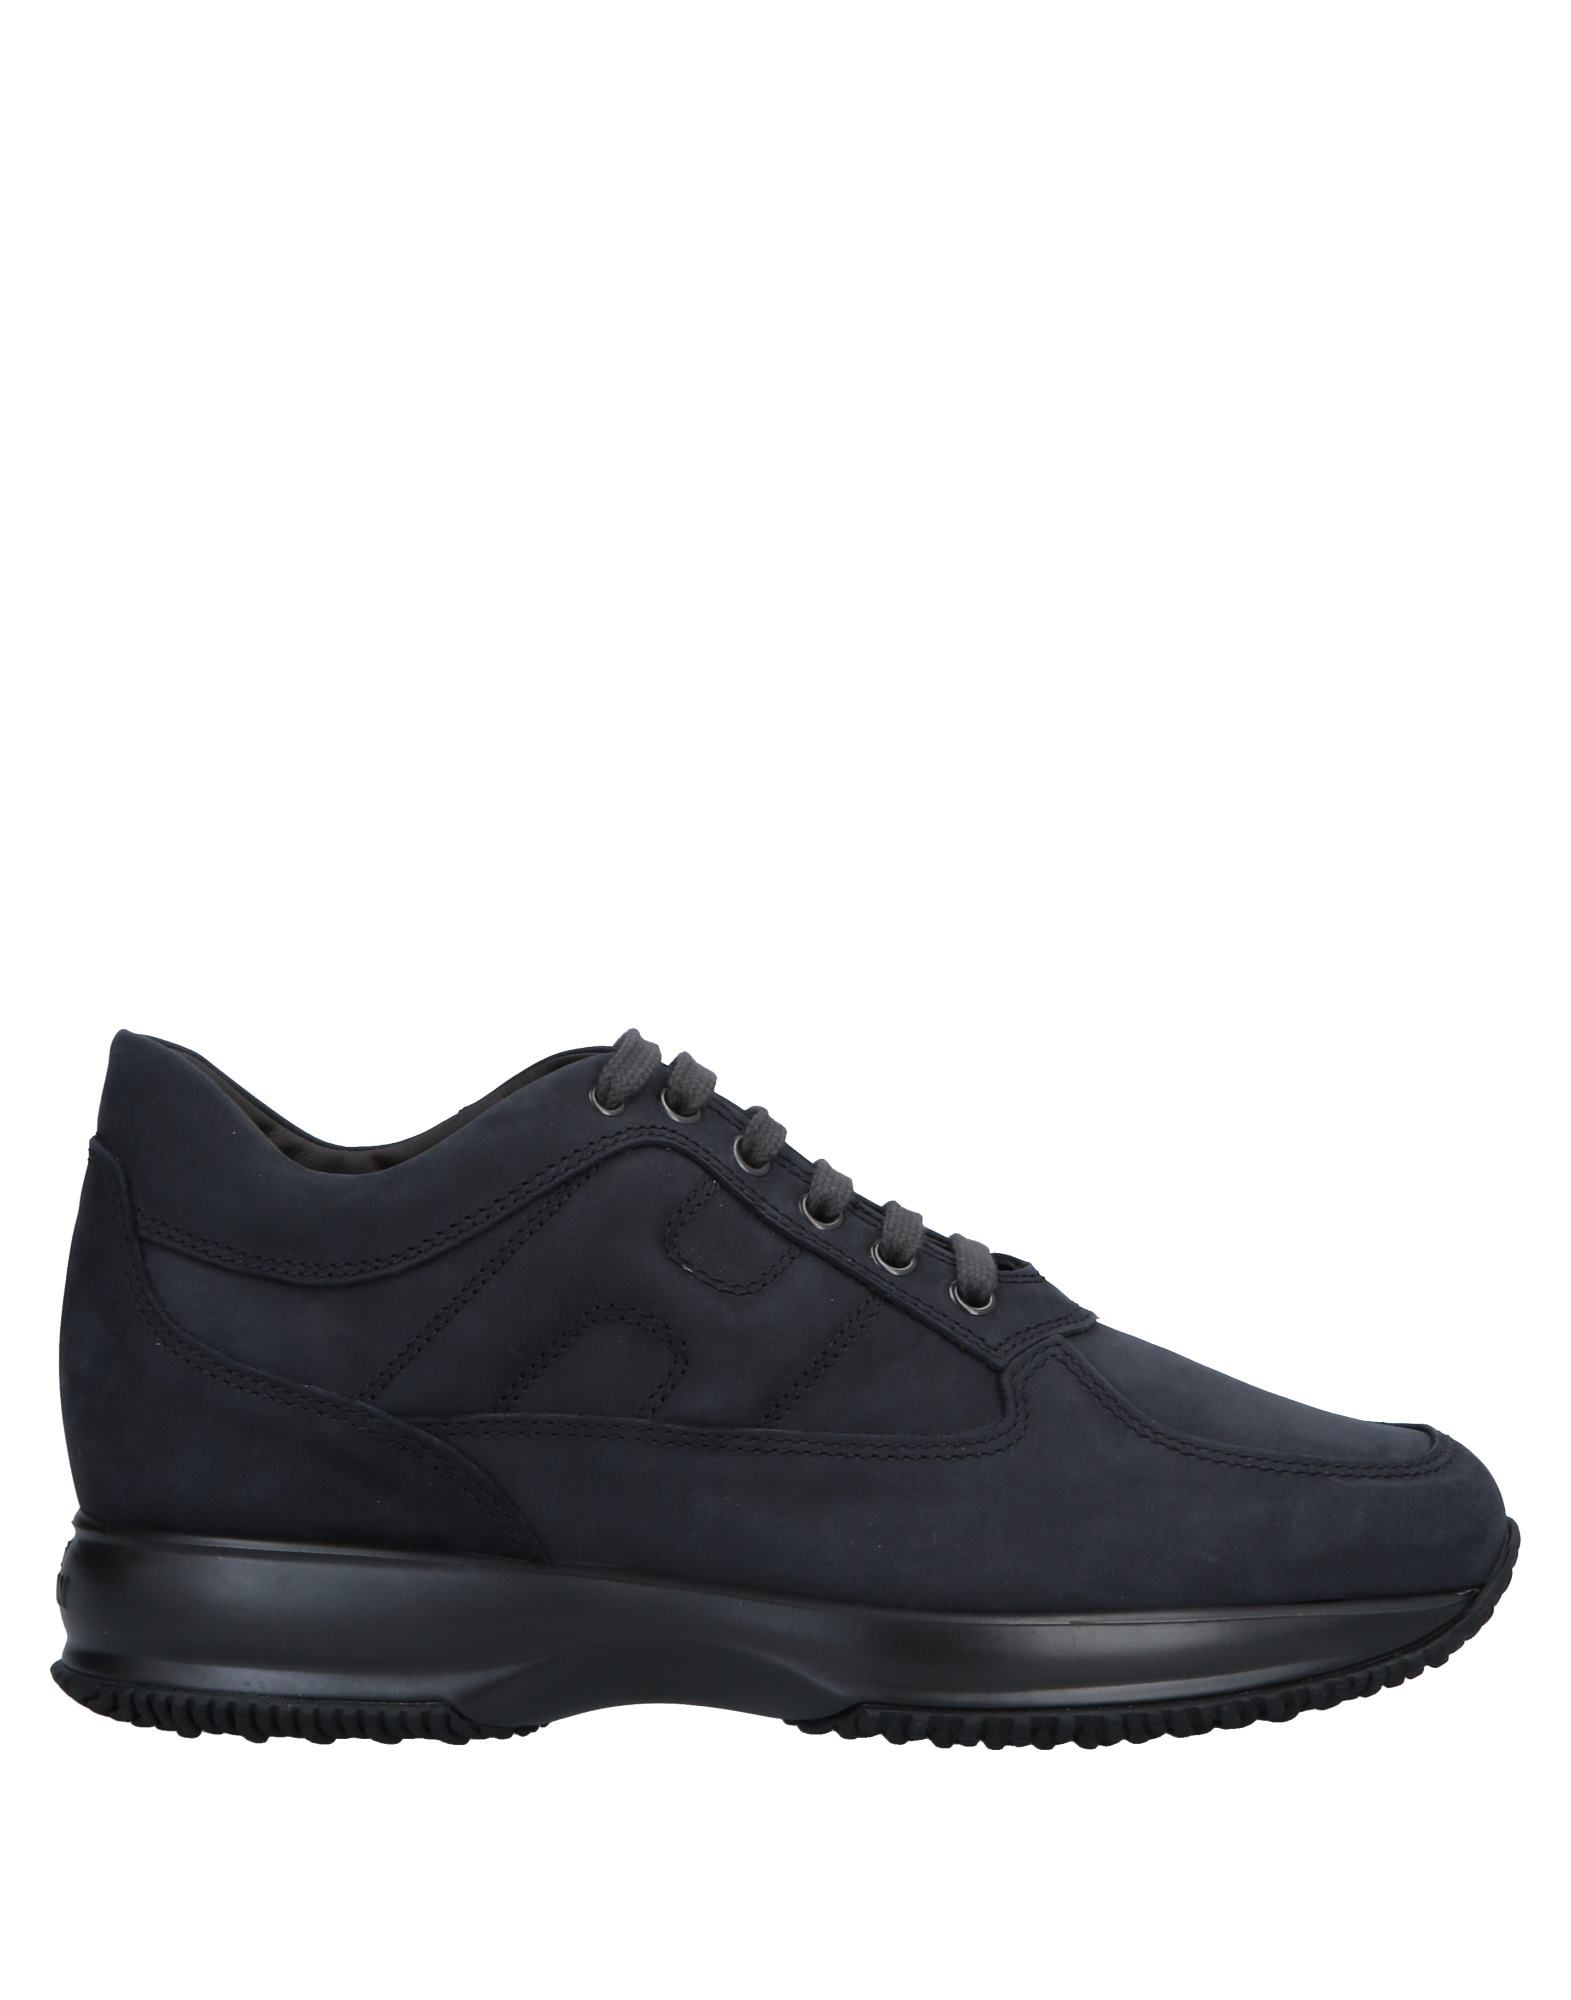 Sneakers Hogan Uomo - 11559687IH elegante